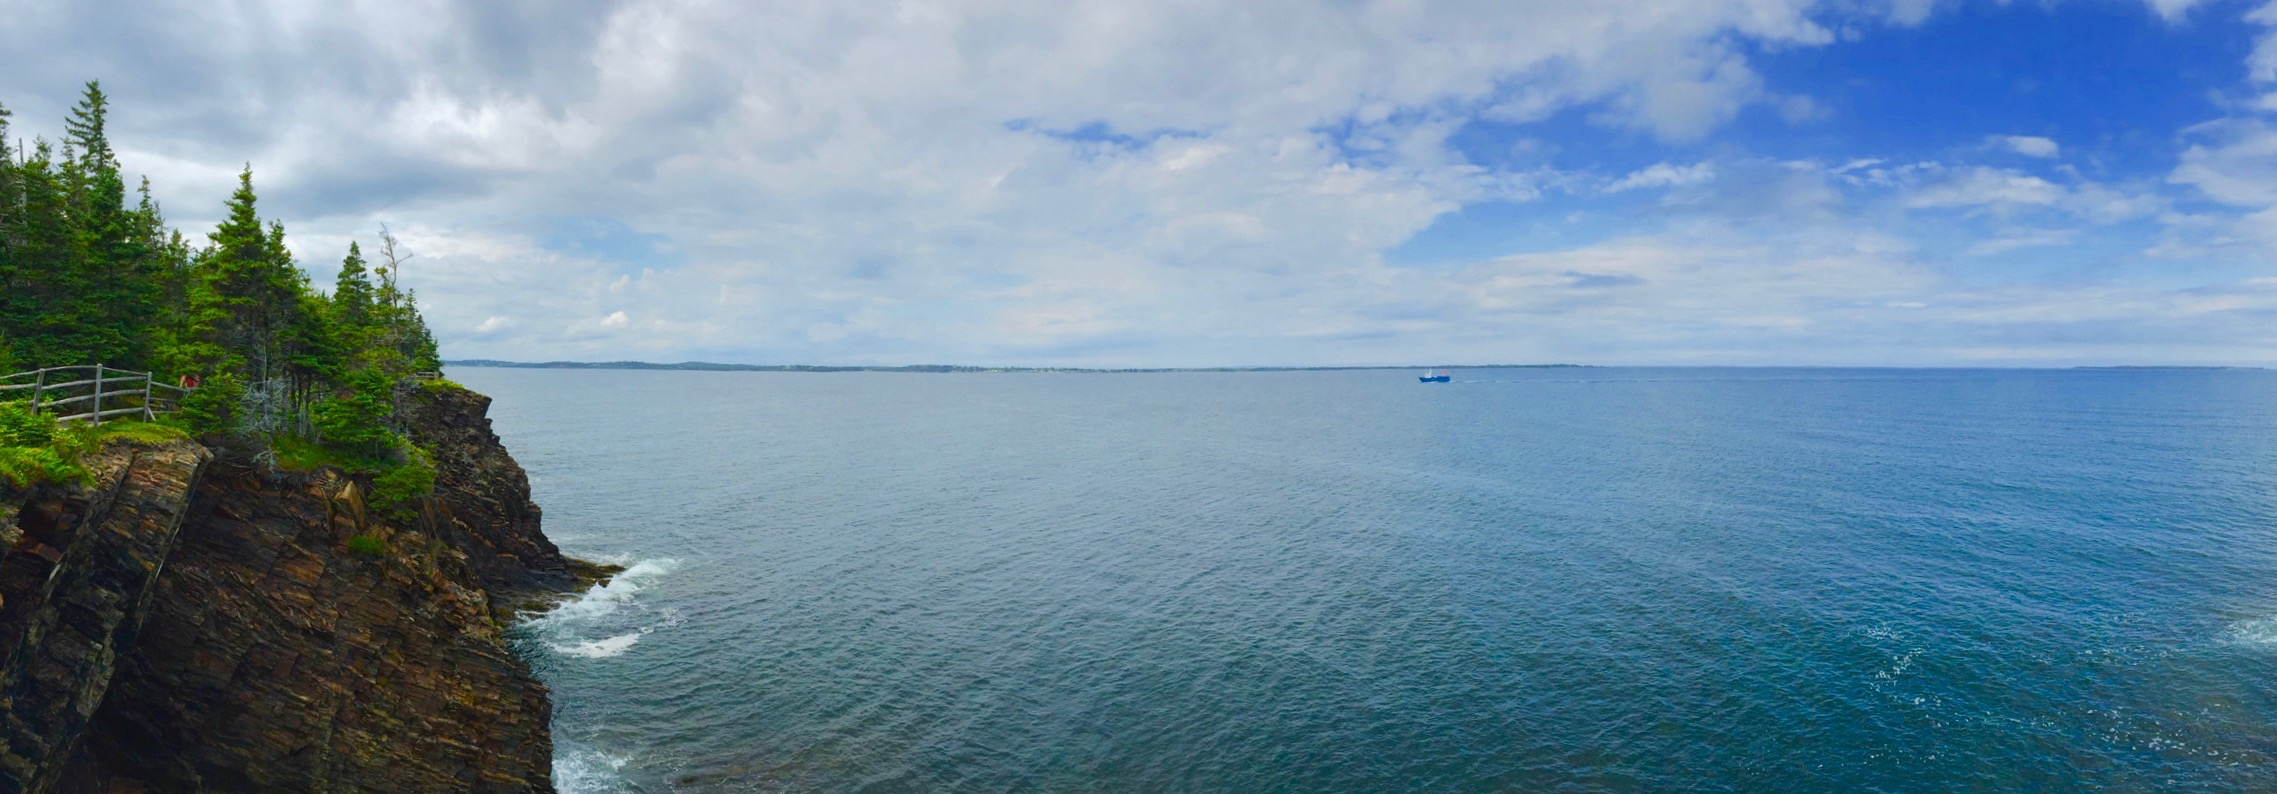 Sea cliffs and the Atlantic Ocean at The Ovens, near Lunenburg, Nova Scotia [OC] [2277 × 794]